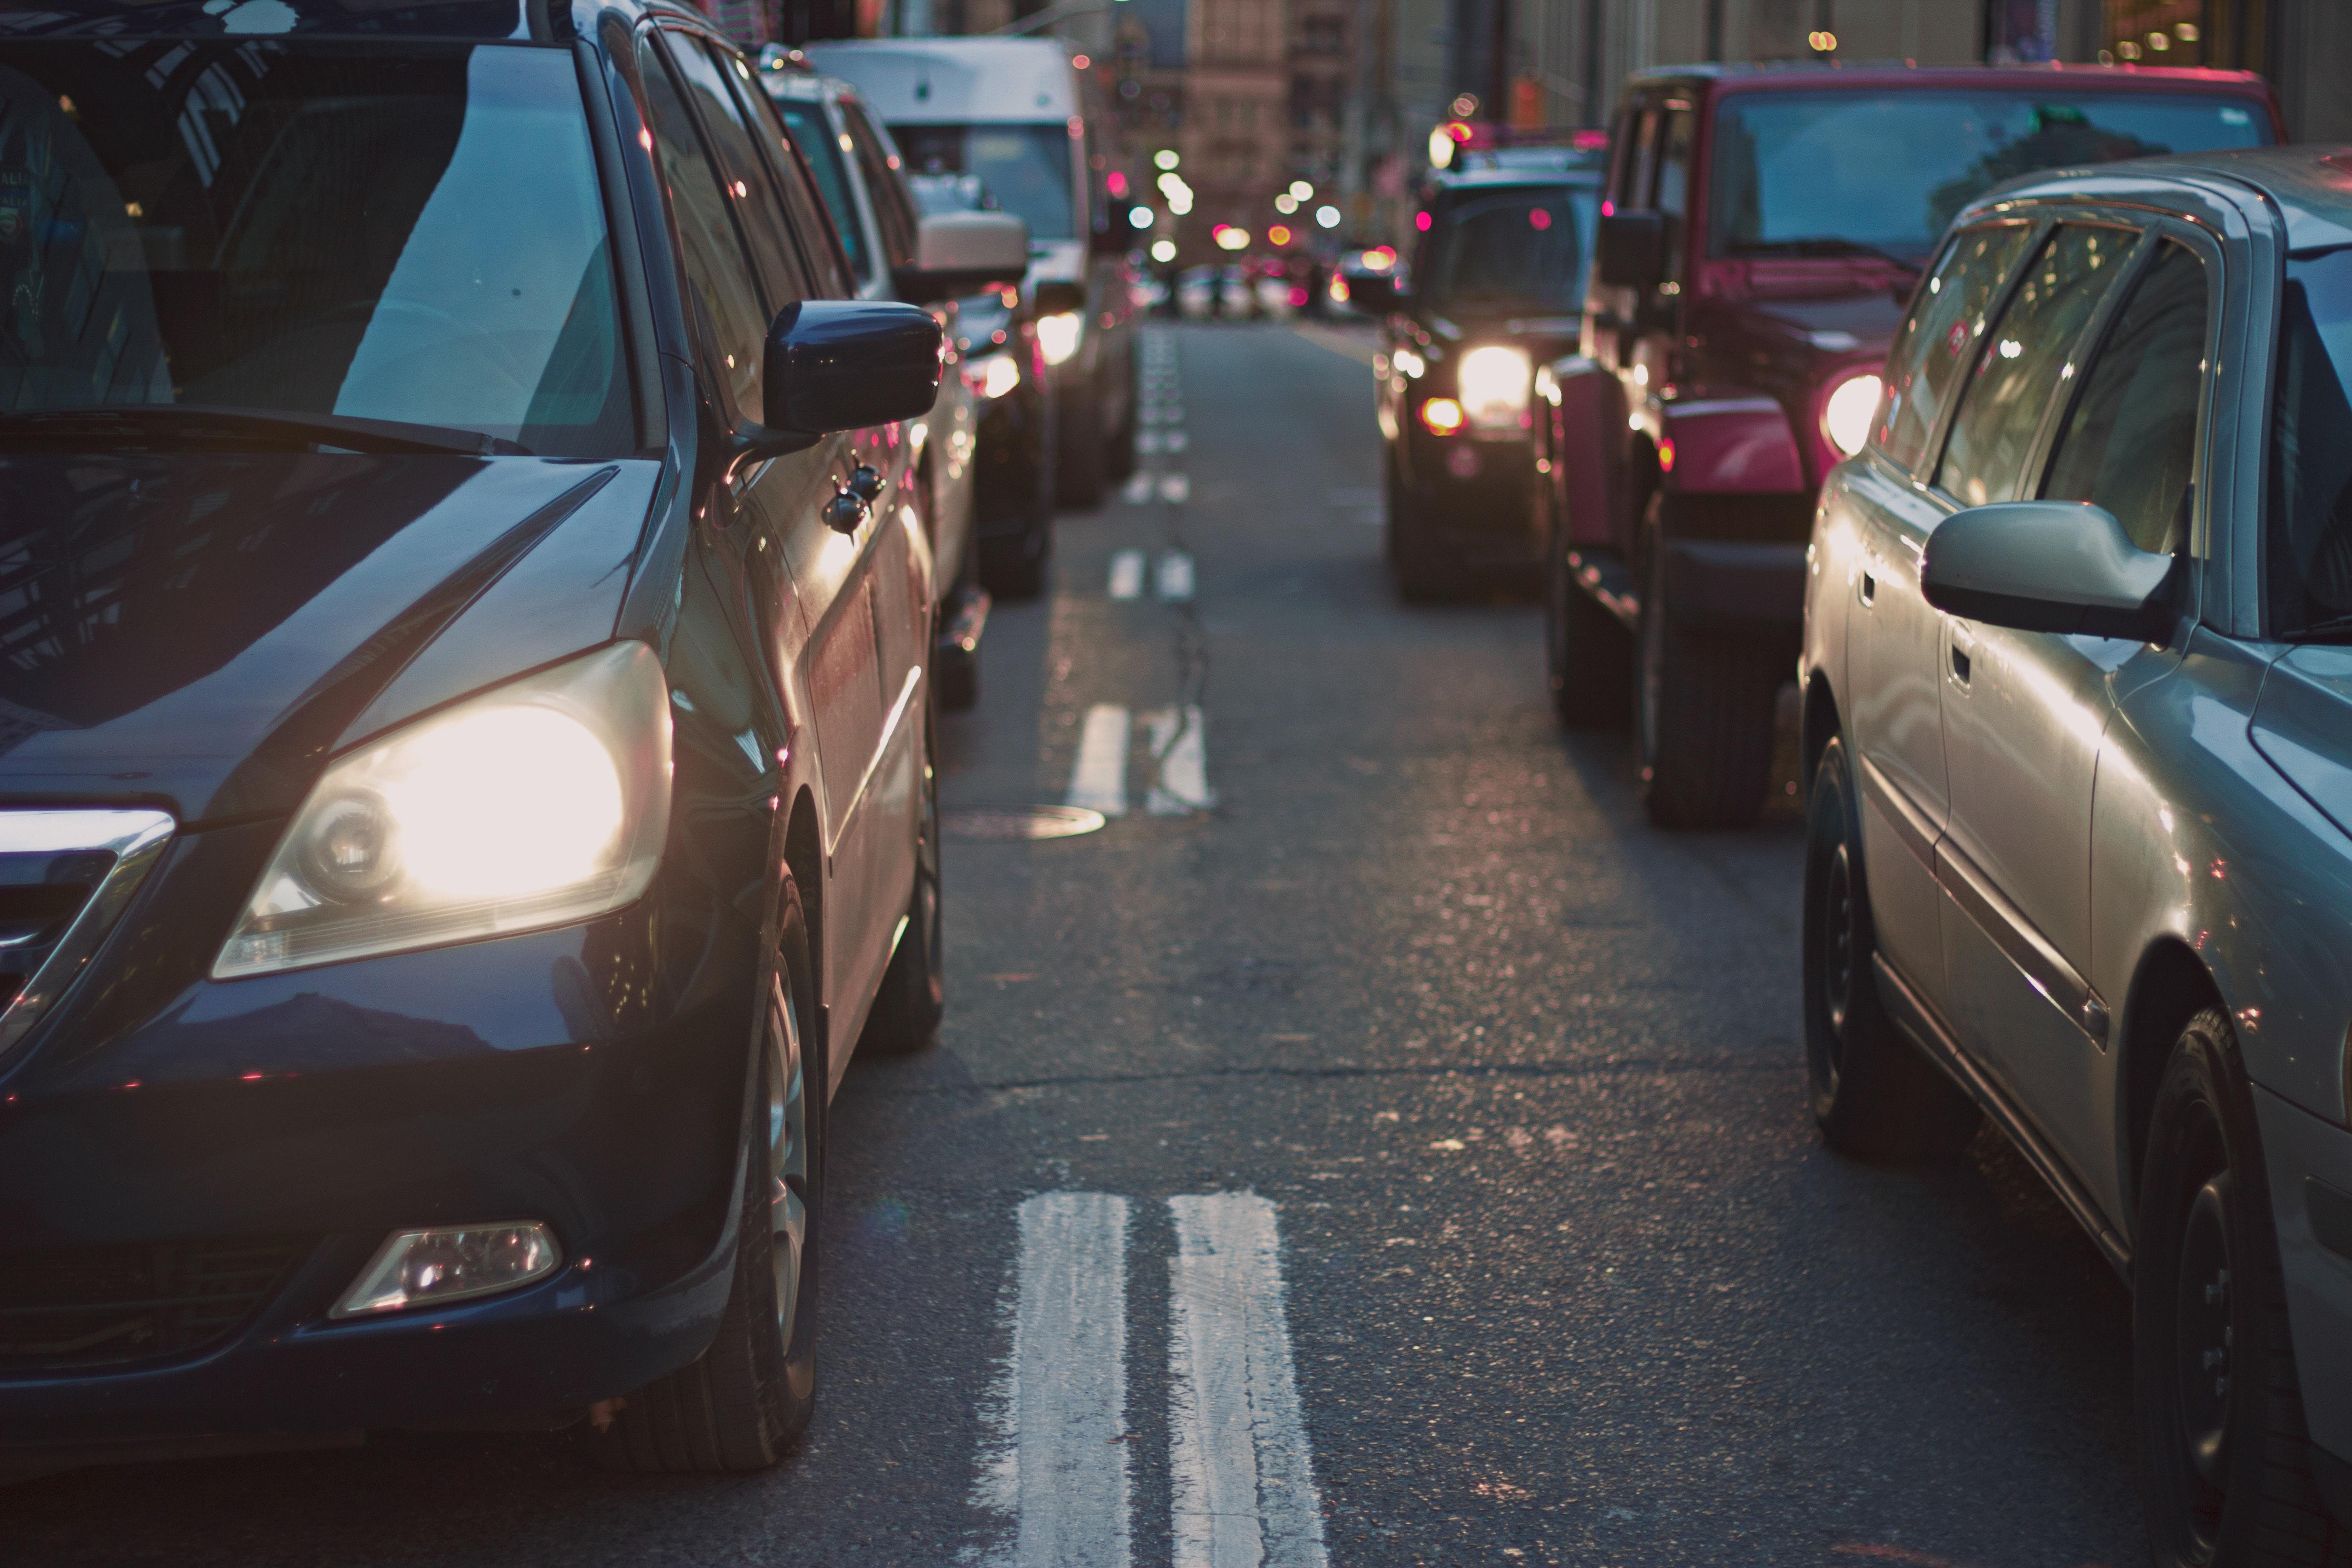 Oklahoma City, OK – Car Crash Along Pennsylvania Avenue Leaves at Least One Injured